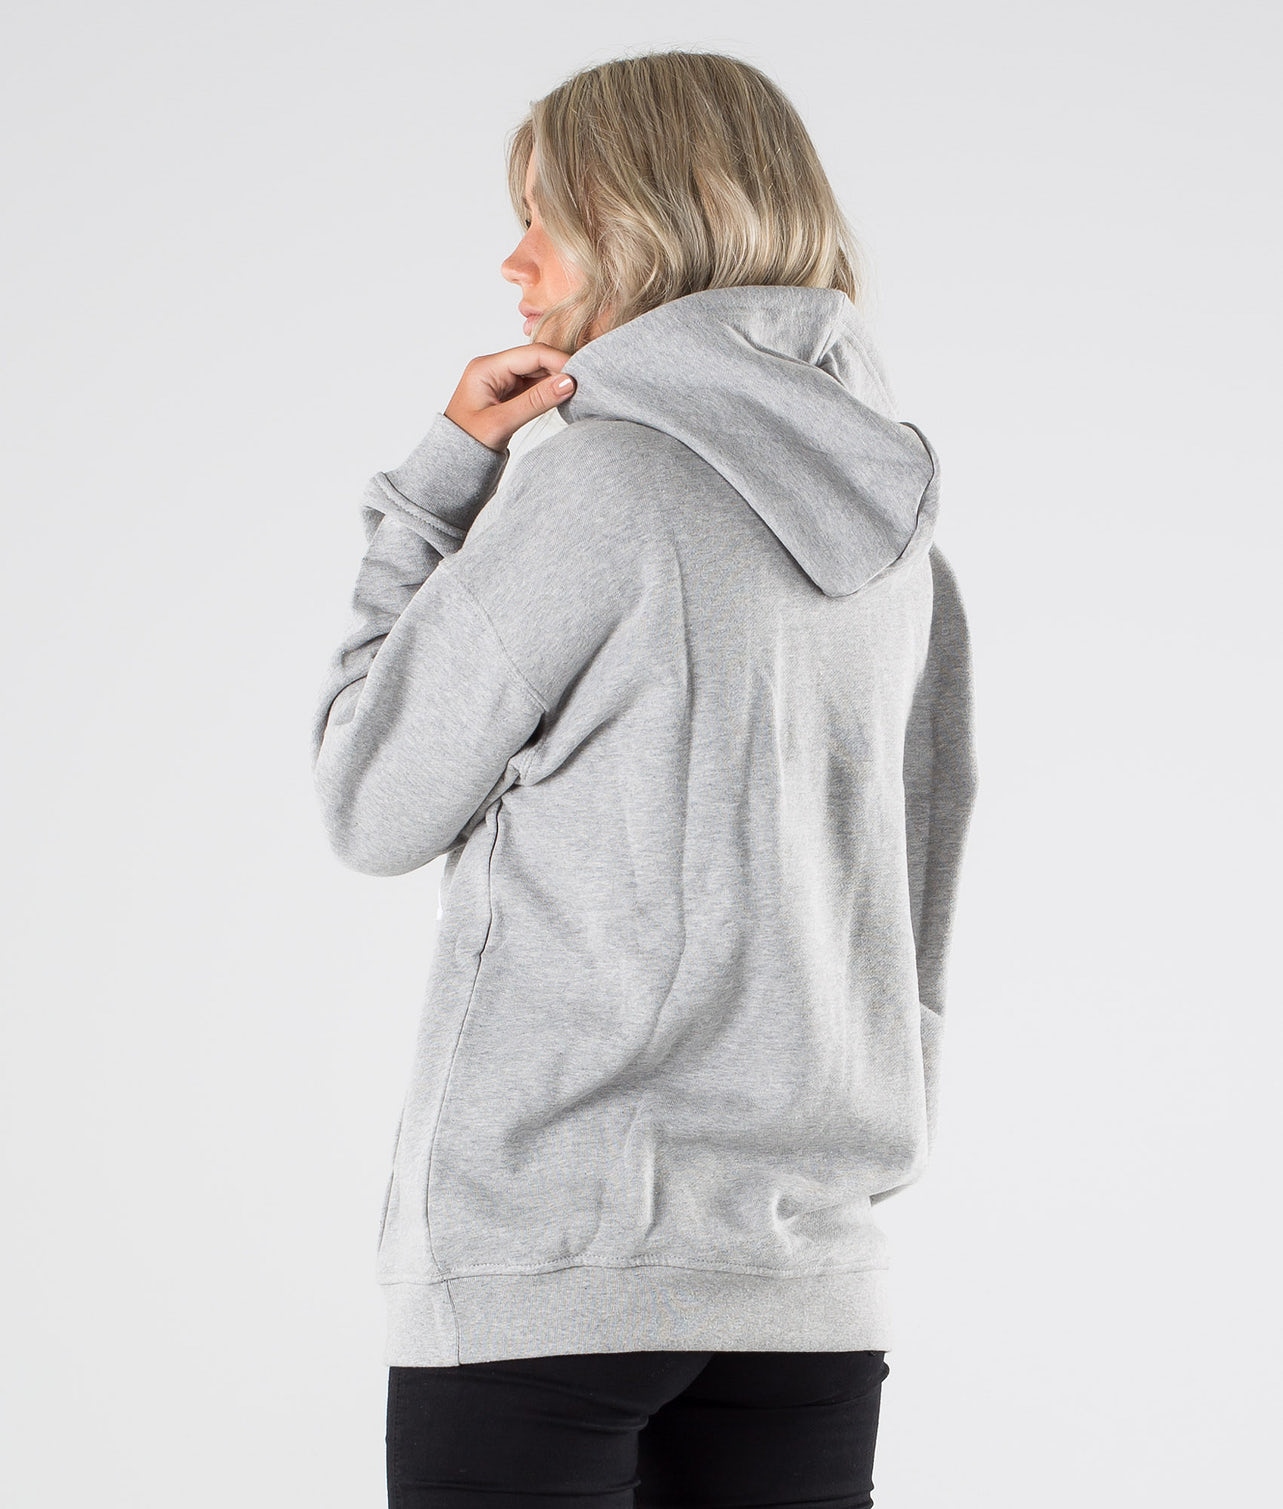 Adidas Originals Trefoil Hoodie      Hood Medium Grey Heather/White